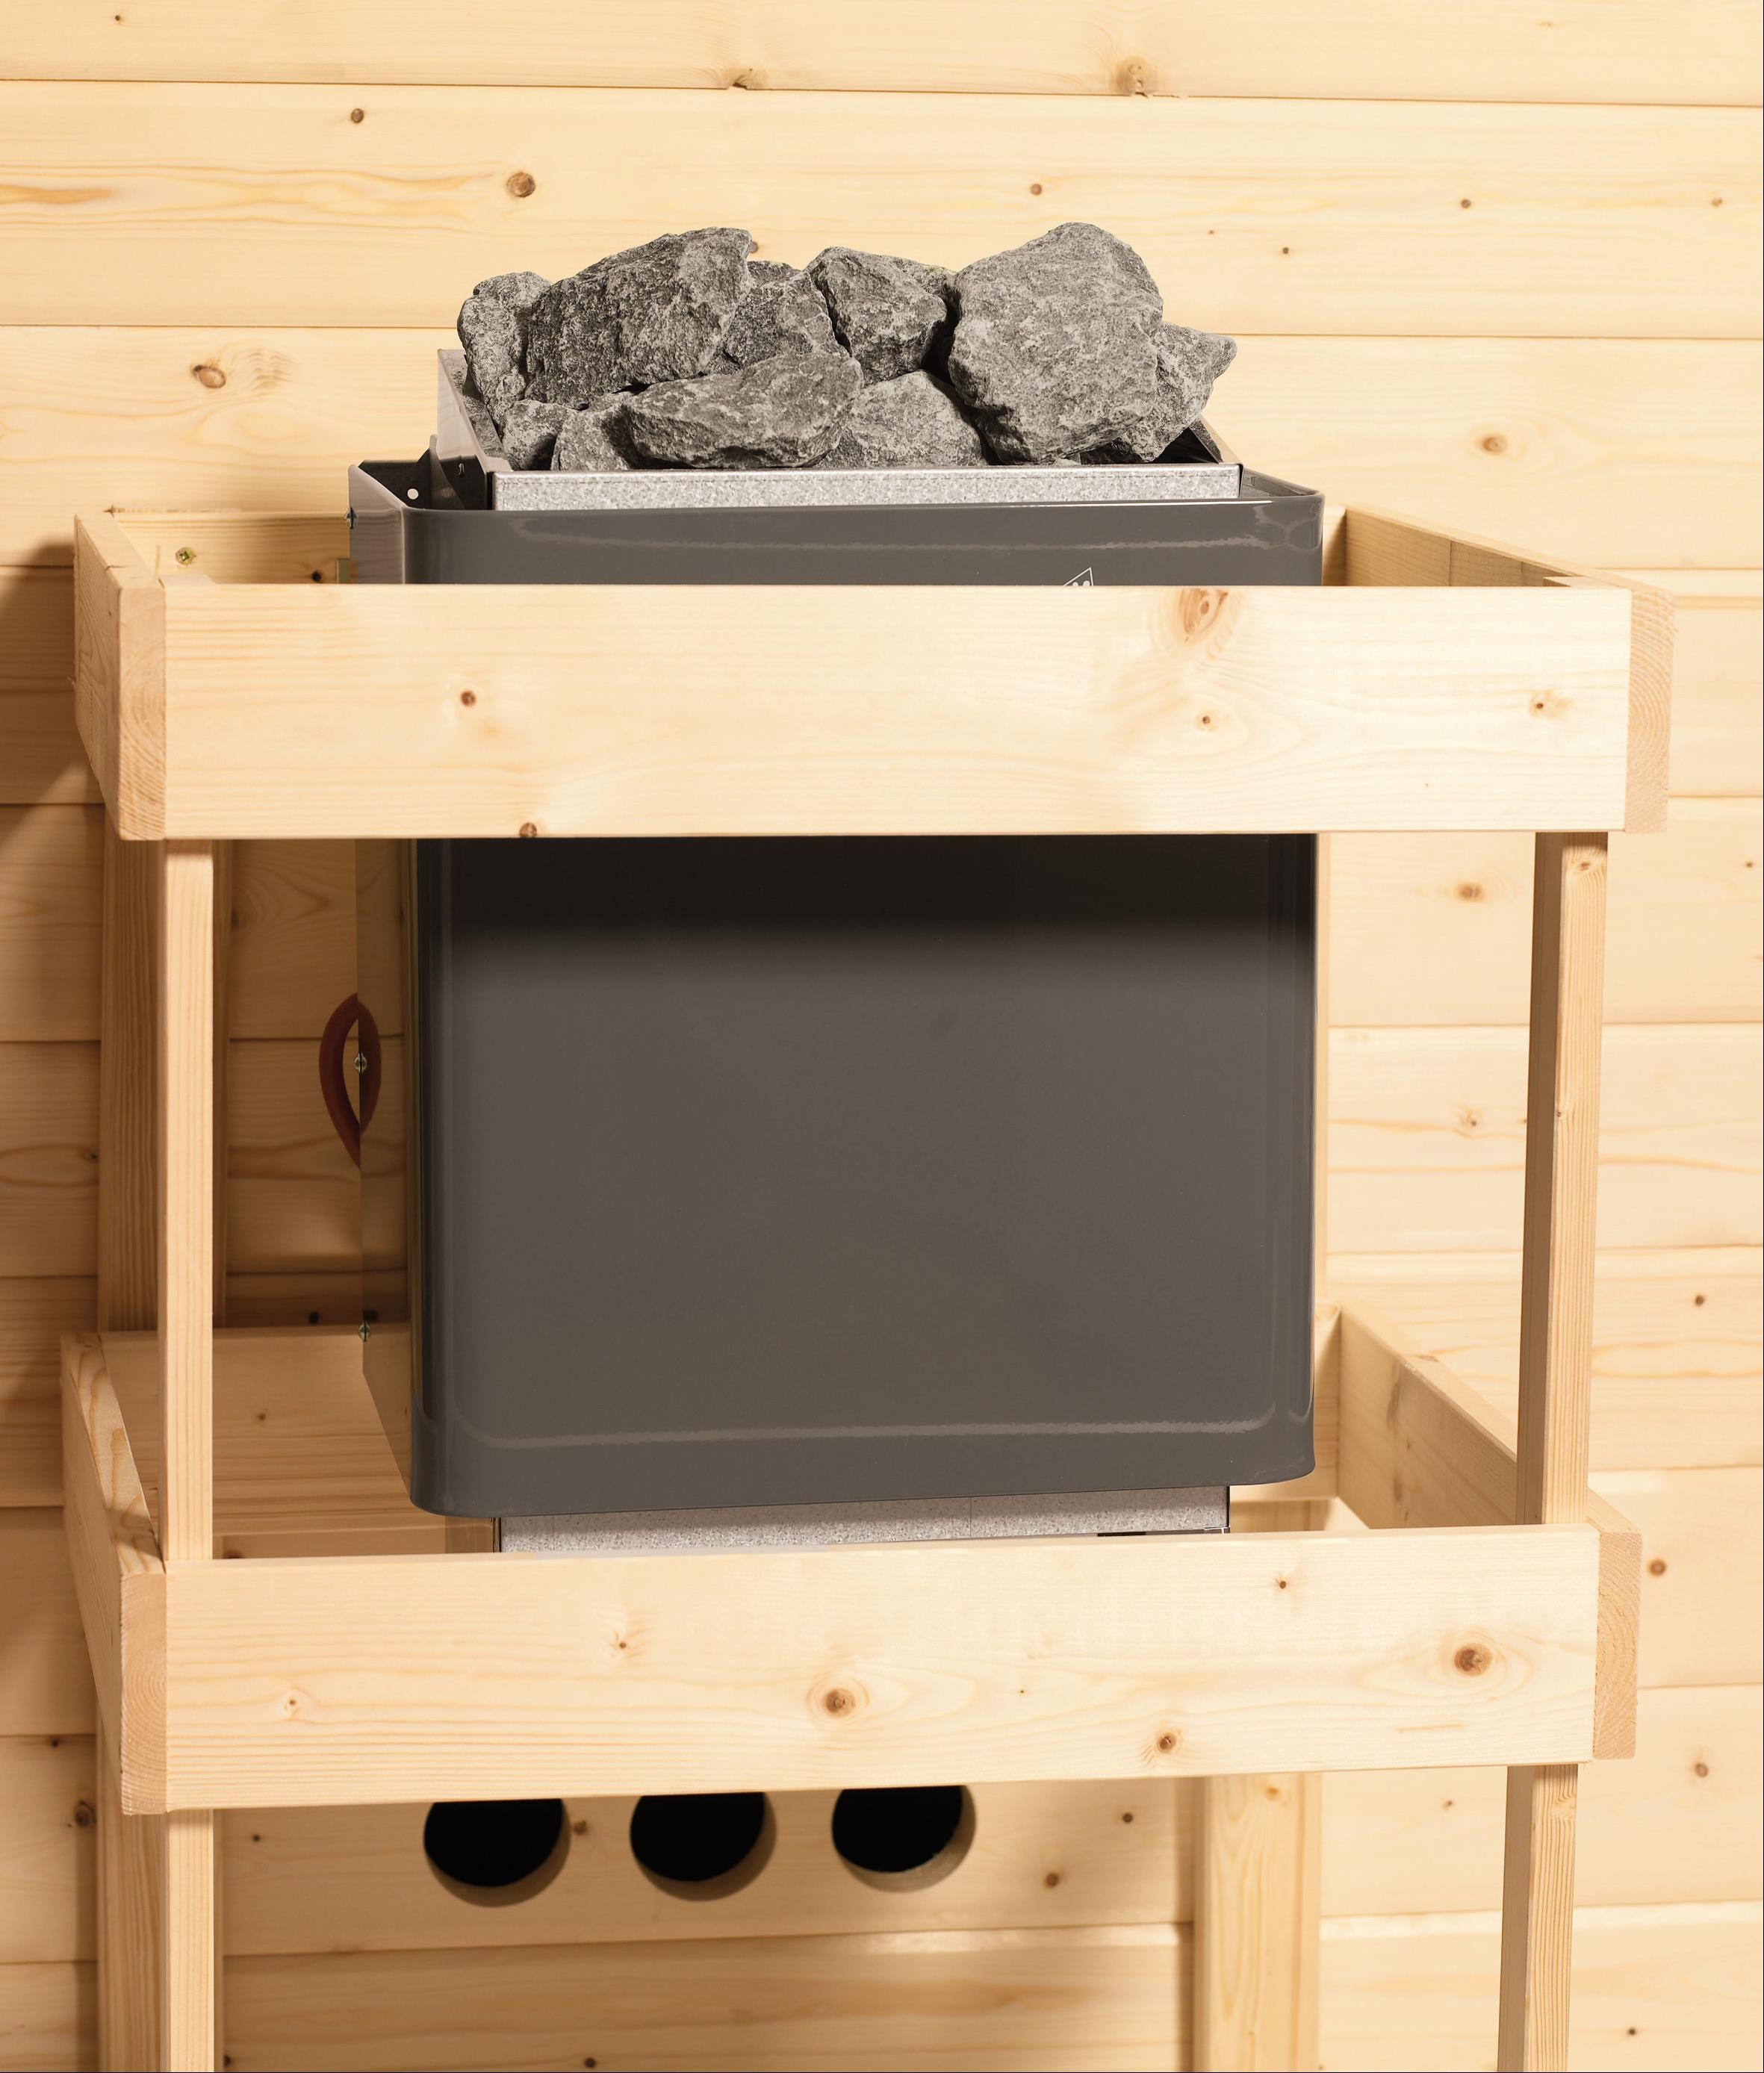 Woodfeeling Sauna Karla 38mm Kranz Ofen 9kW intern Tür Klarglas Bild 9